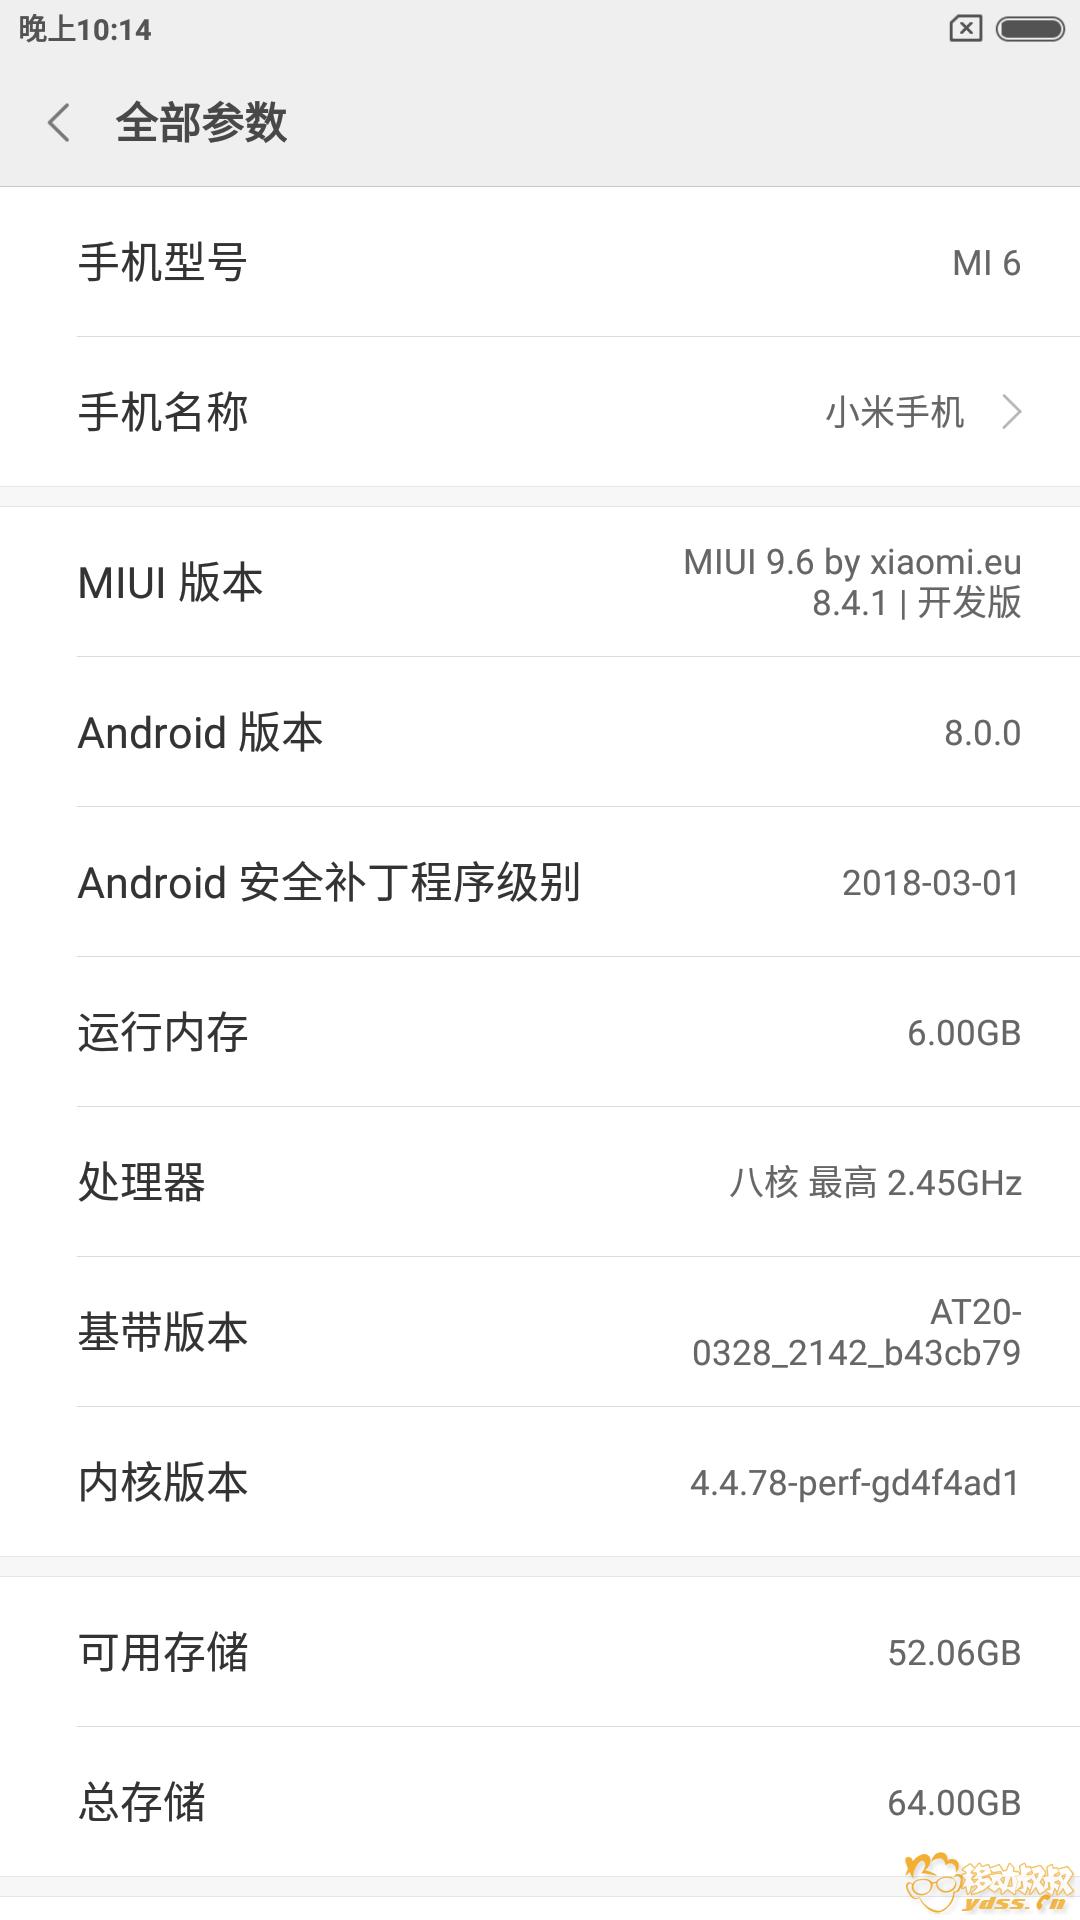 Screenshot_1970-09-16-22-14-37-799_com.android.se.png